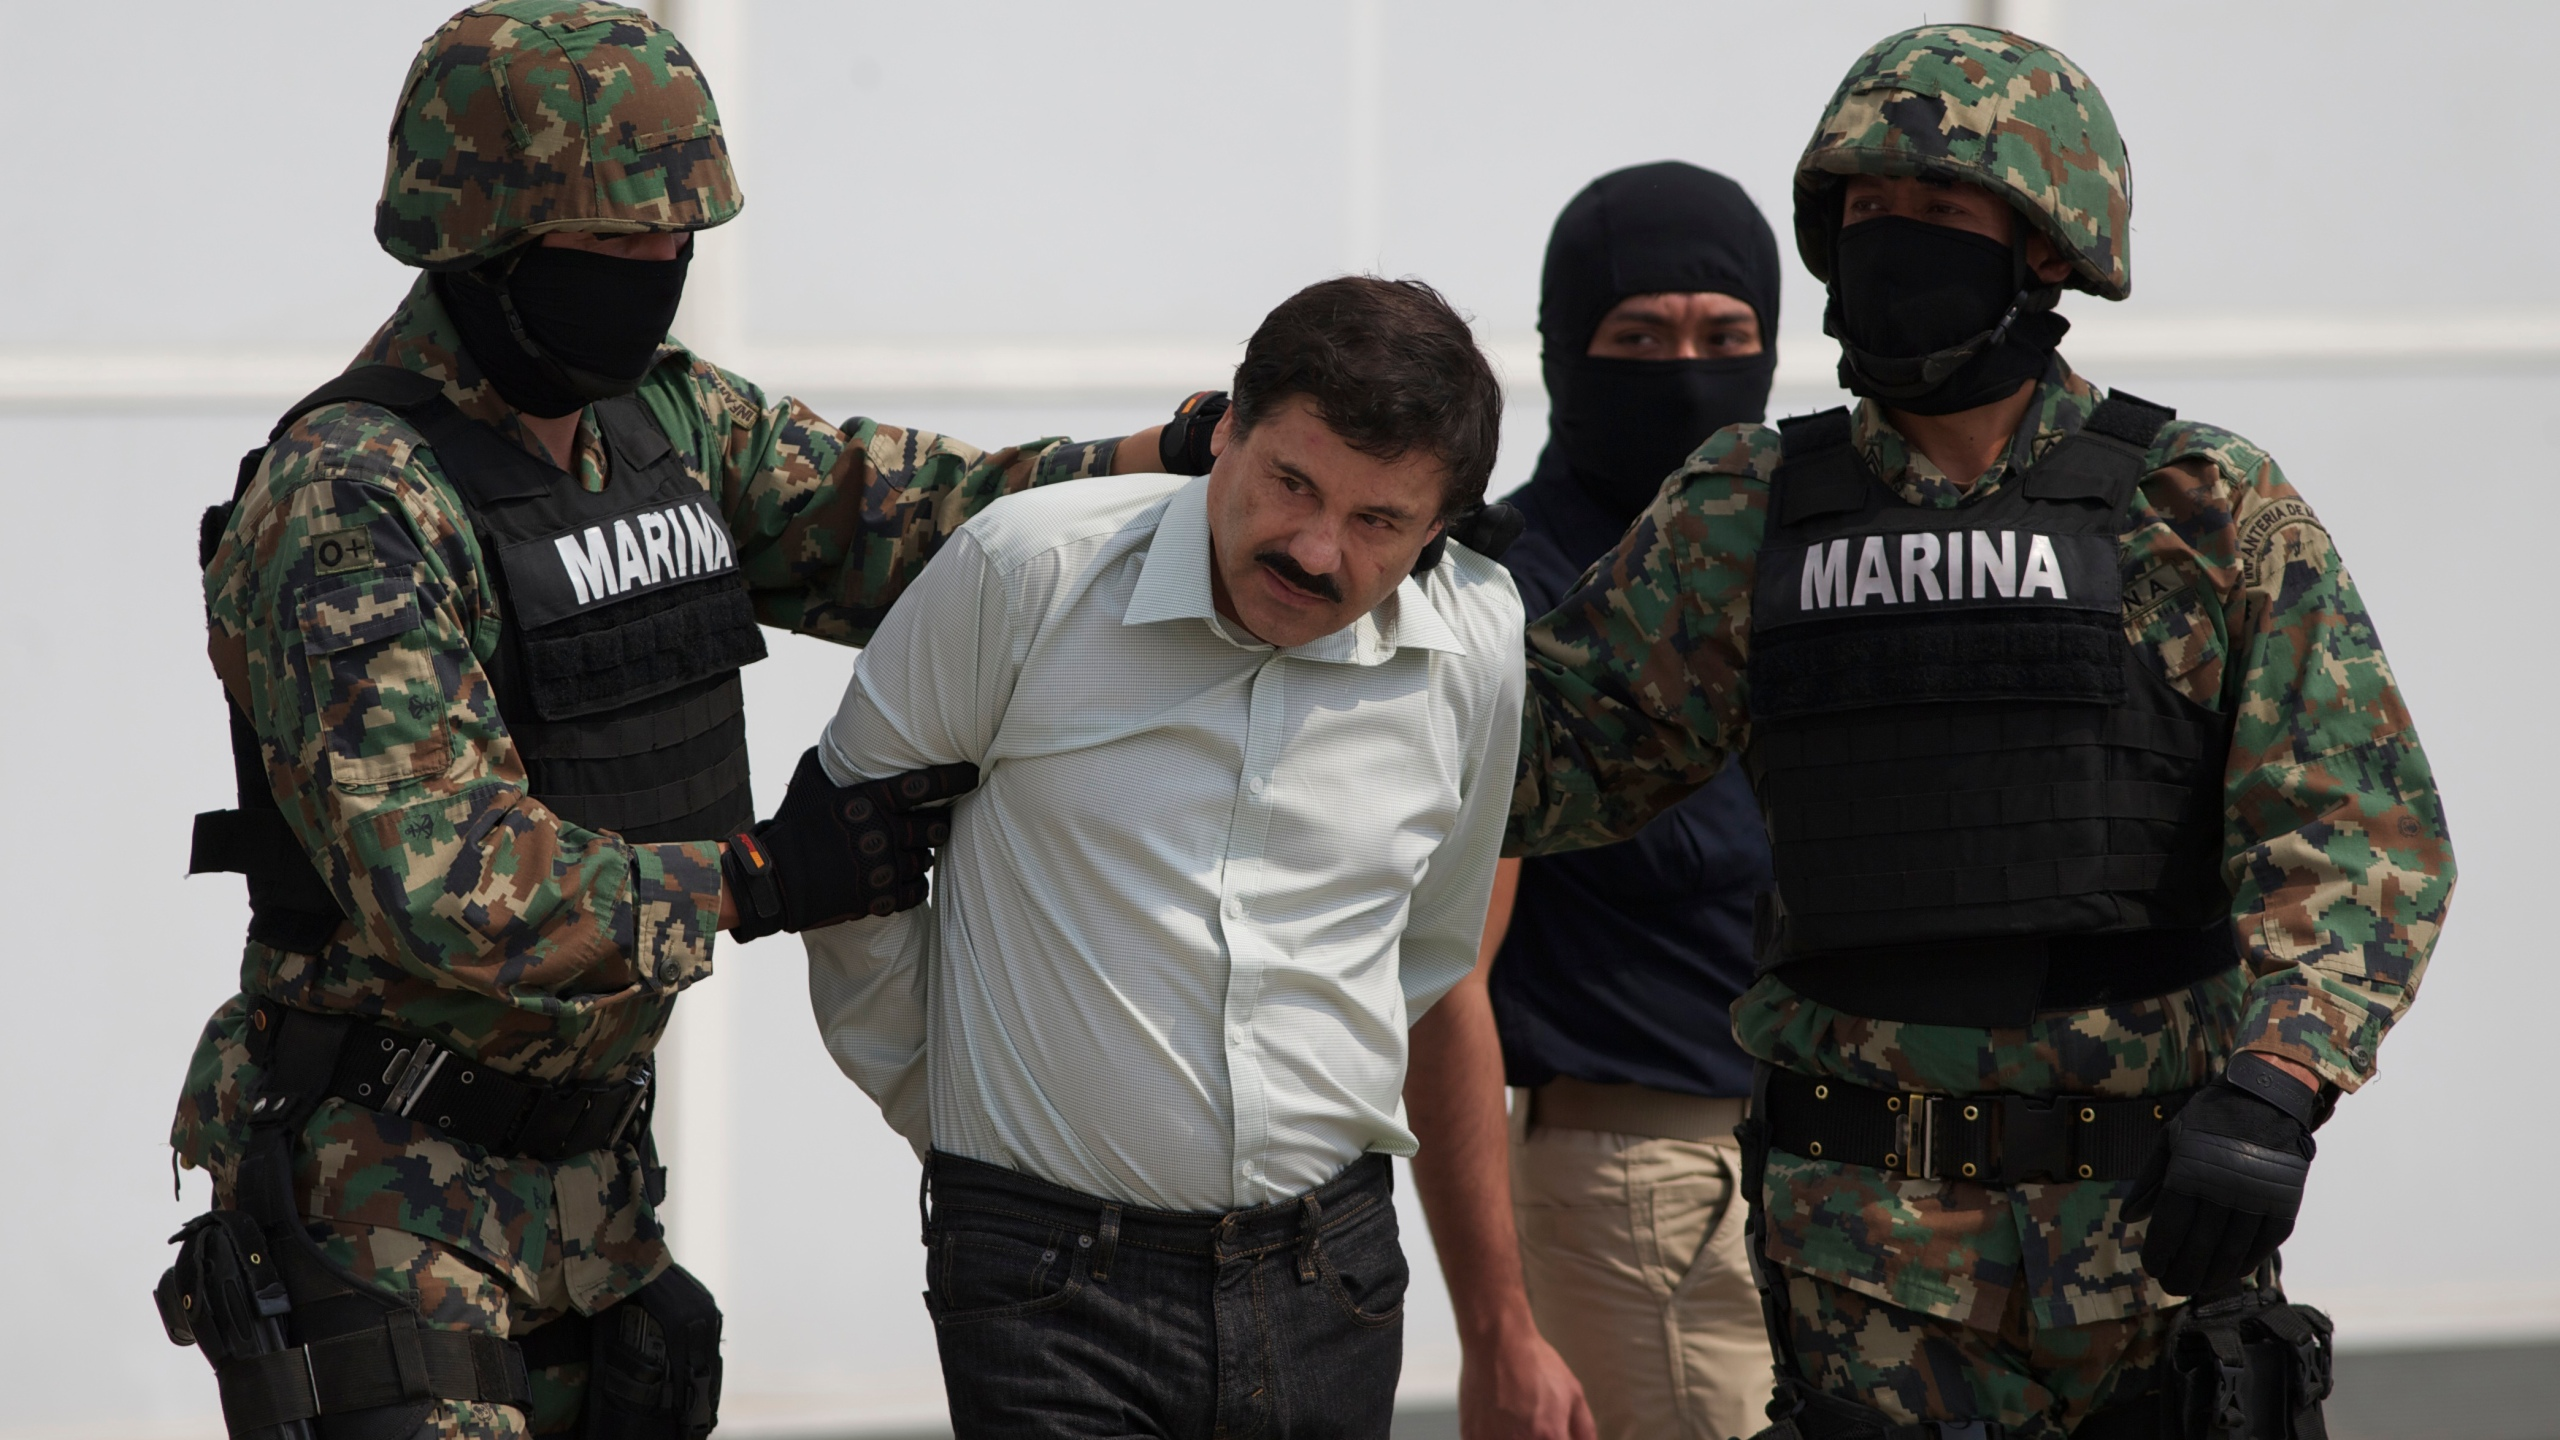 El_Chapo_Prosecution_20654-159532.jpg77765017